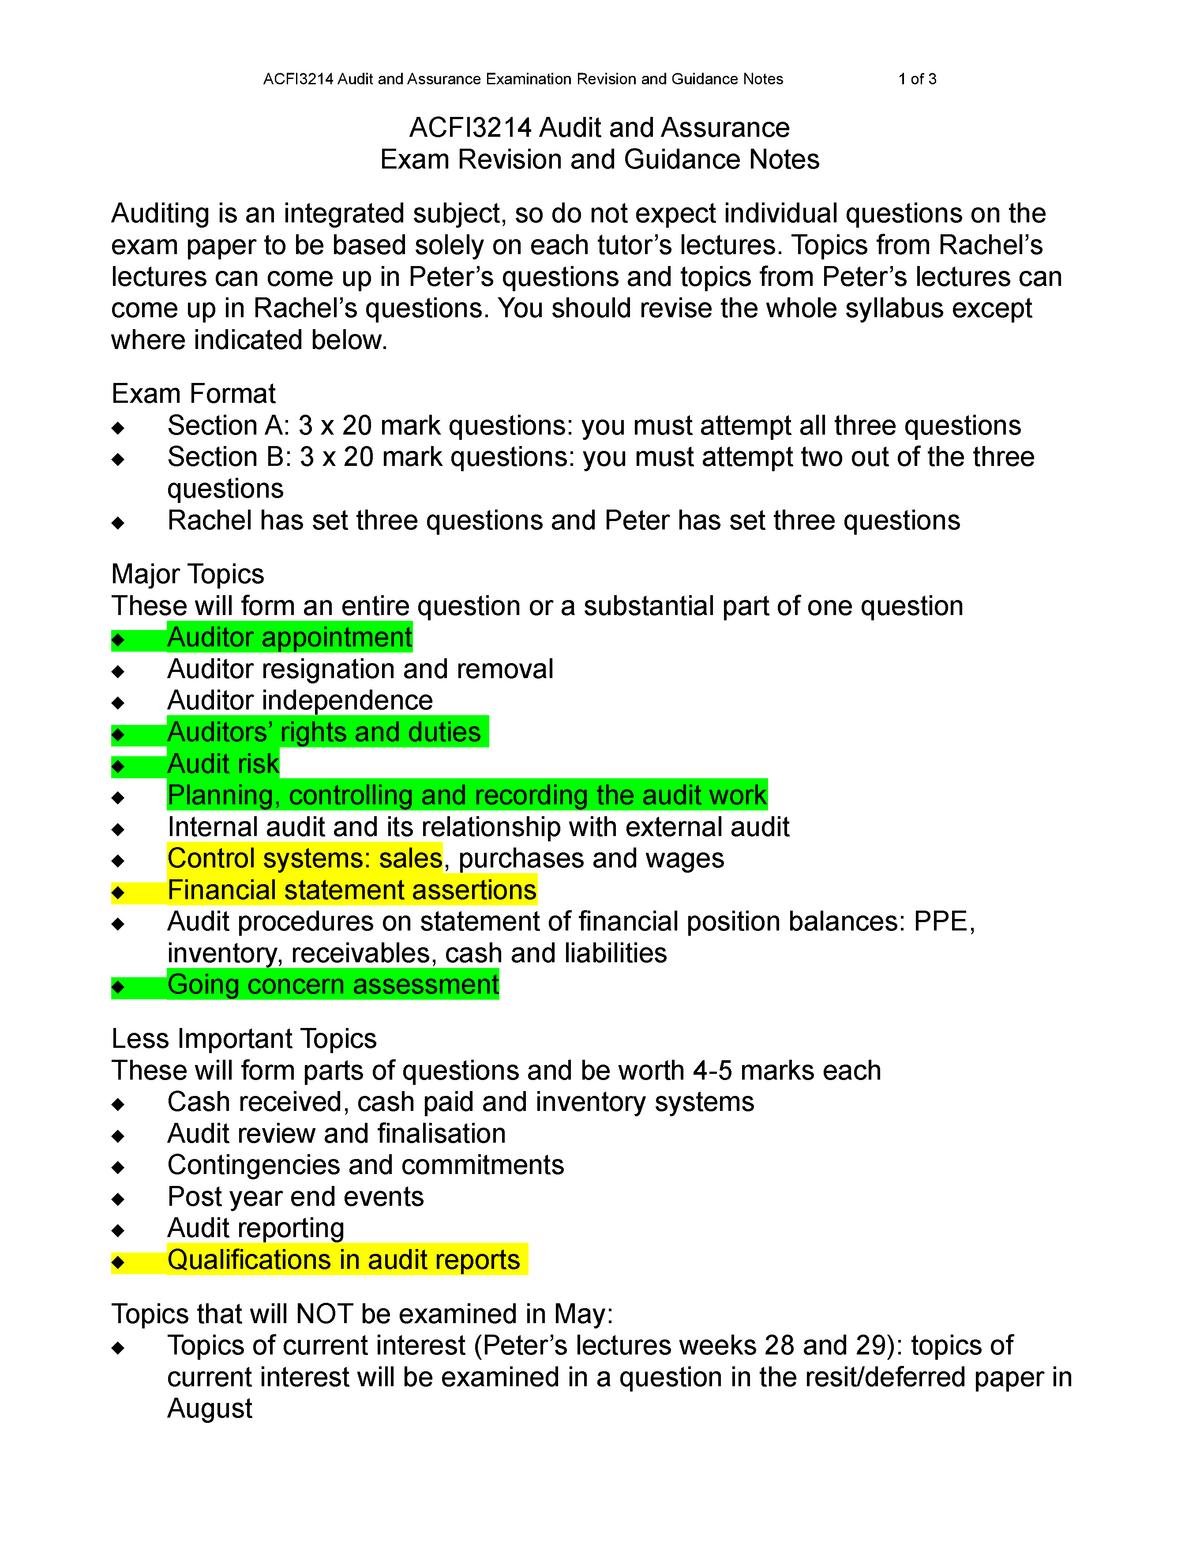 Audit revision - ACFI 5031 - StuDocu